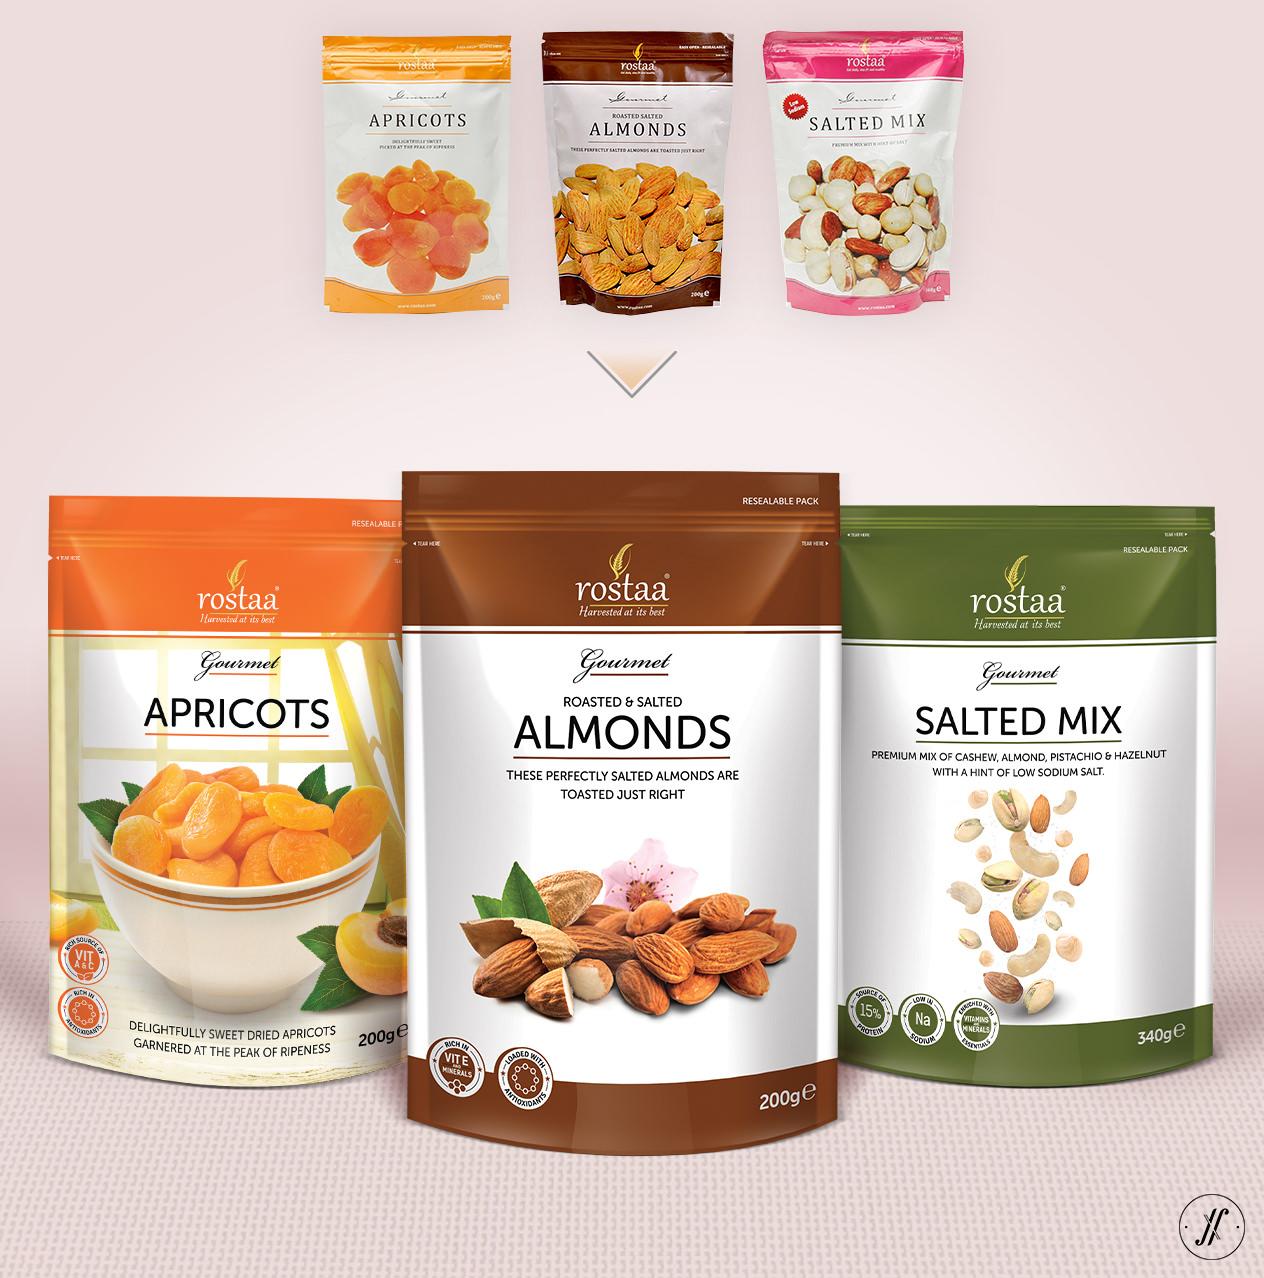 Yellow-Fishes-Best-Branding-Agency-Mumbai-India-Packaging-Design-Agency-Rostaa-Pacakging-Case-Study-range-packaging-design